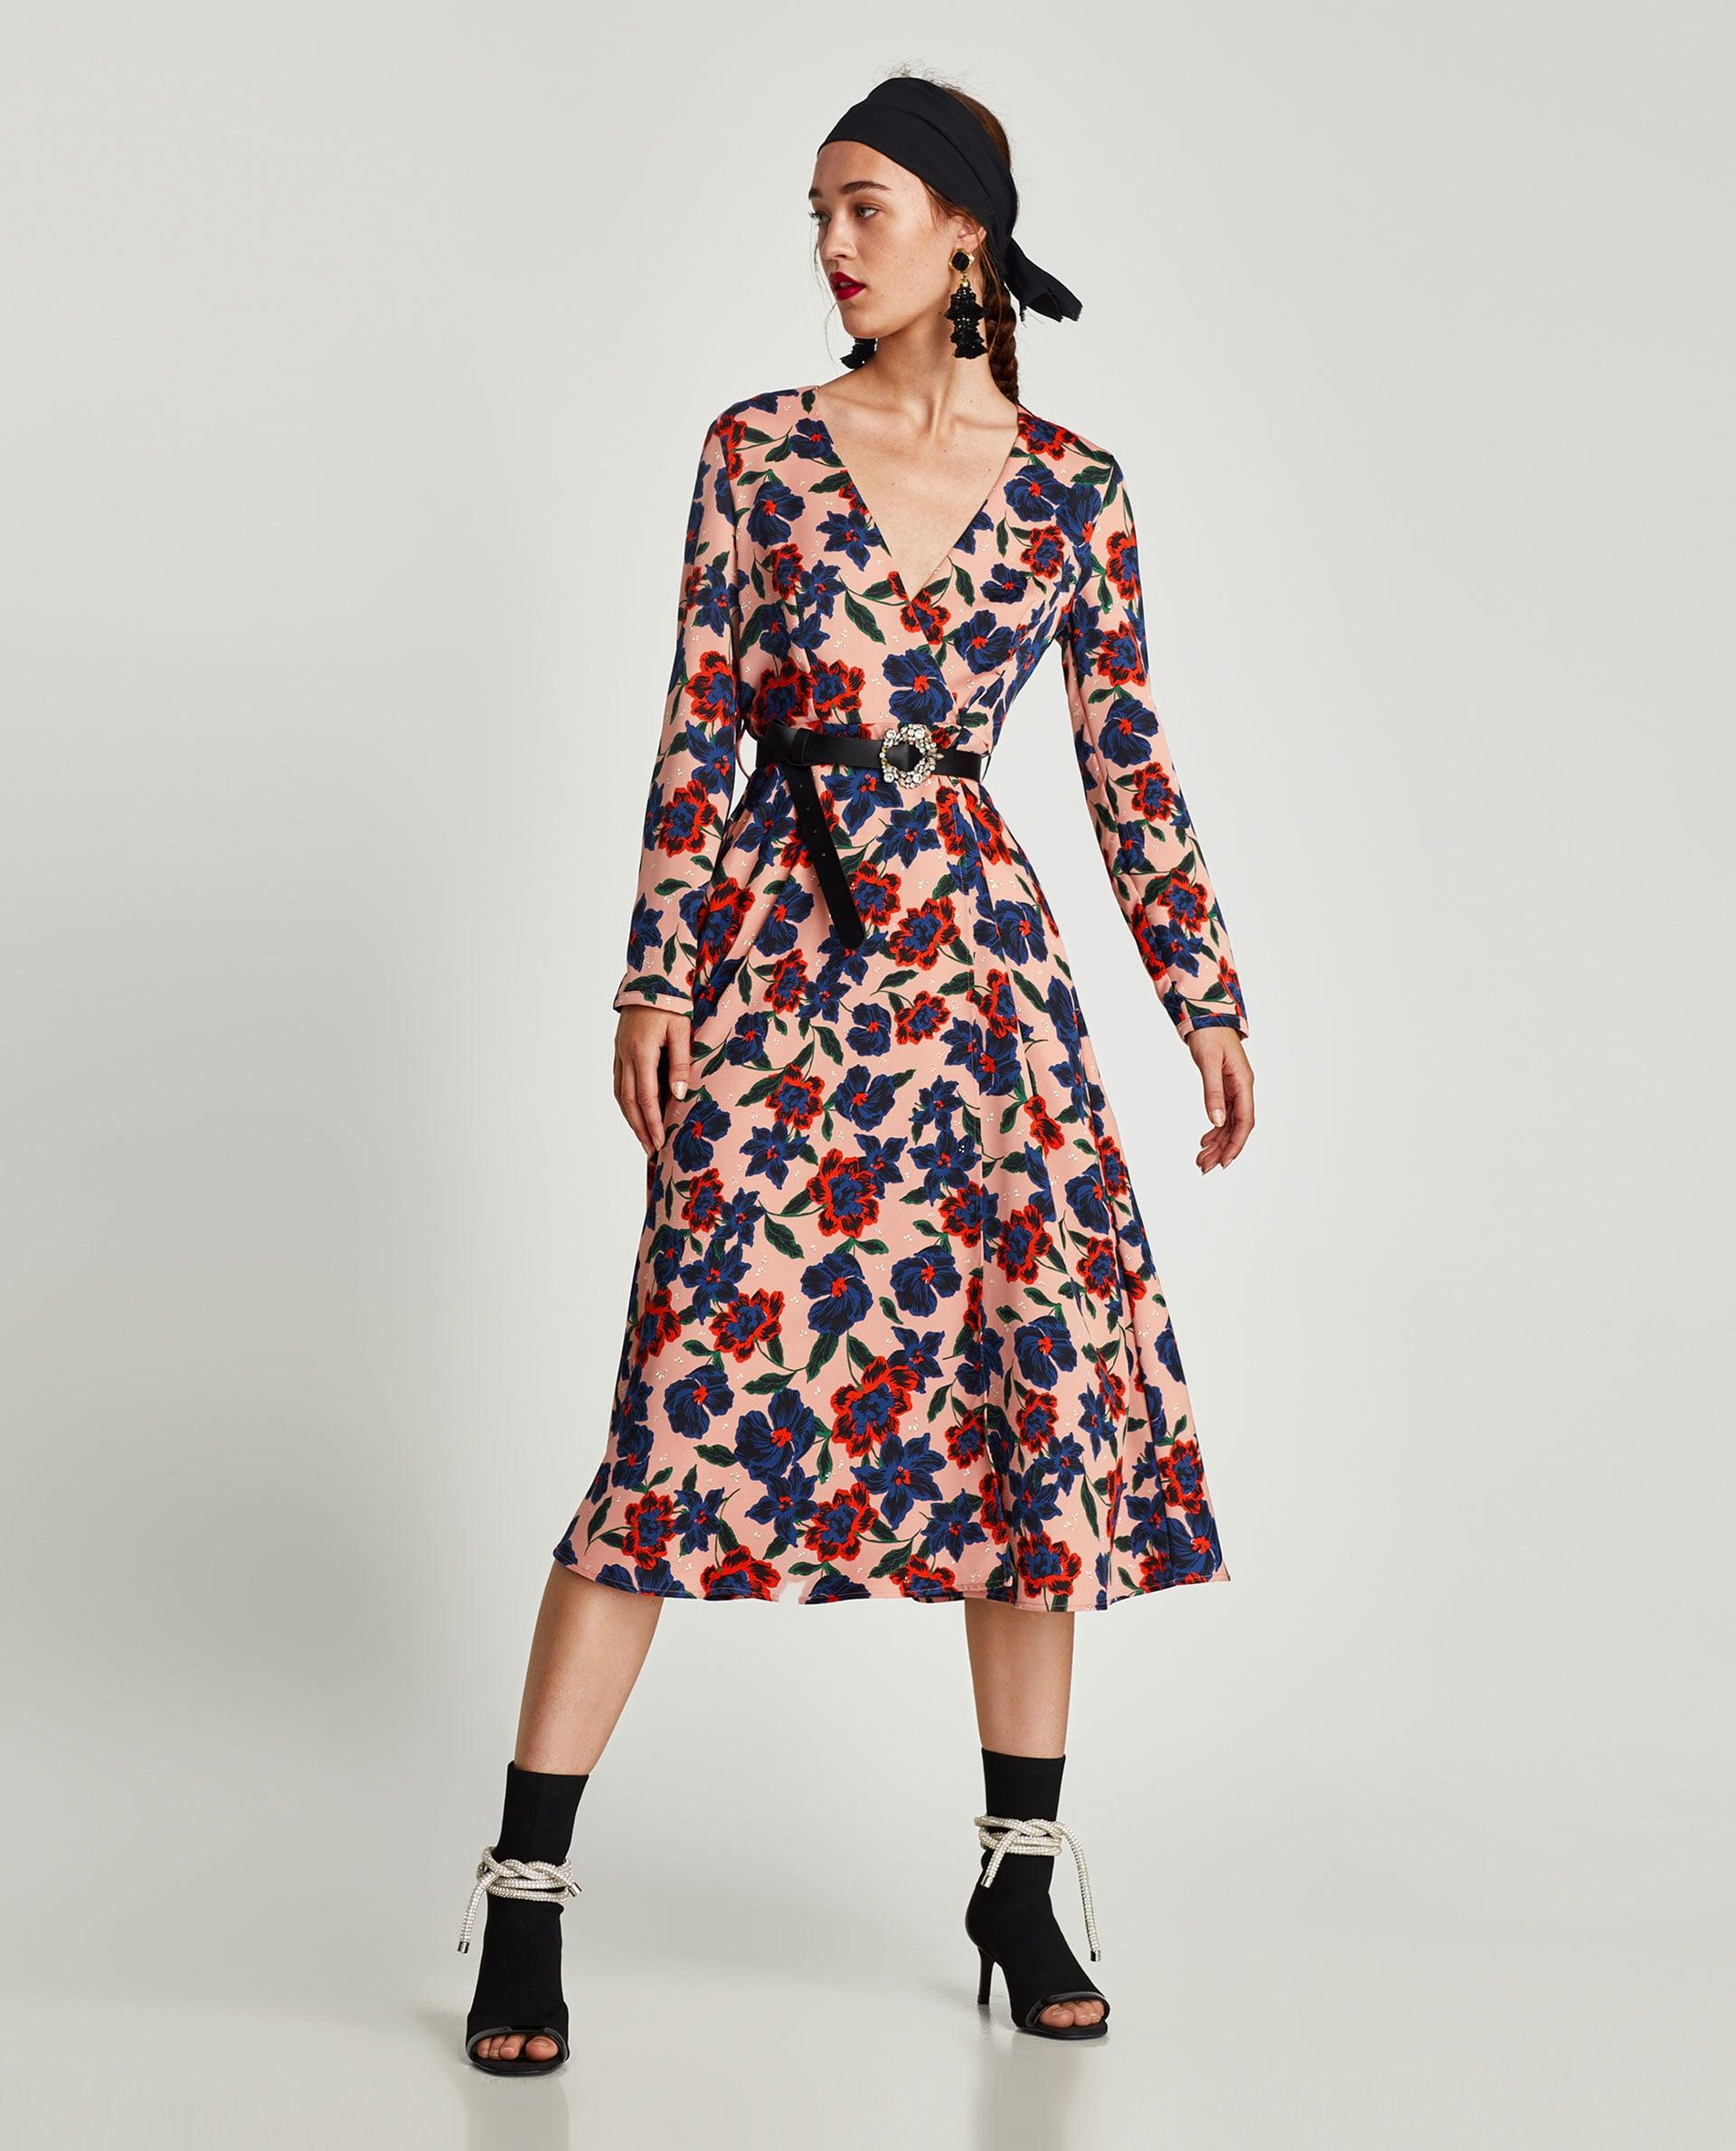 dcca95097 Zara Floral Print Midi Dress | Kate Middleton's Dress Has So Many ...